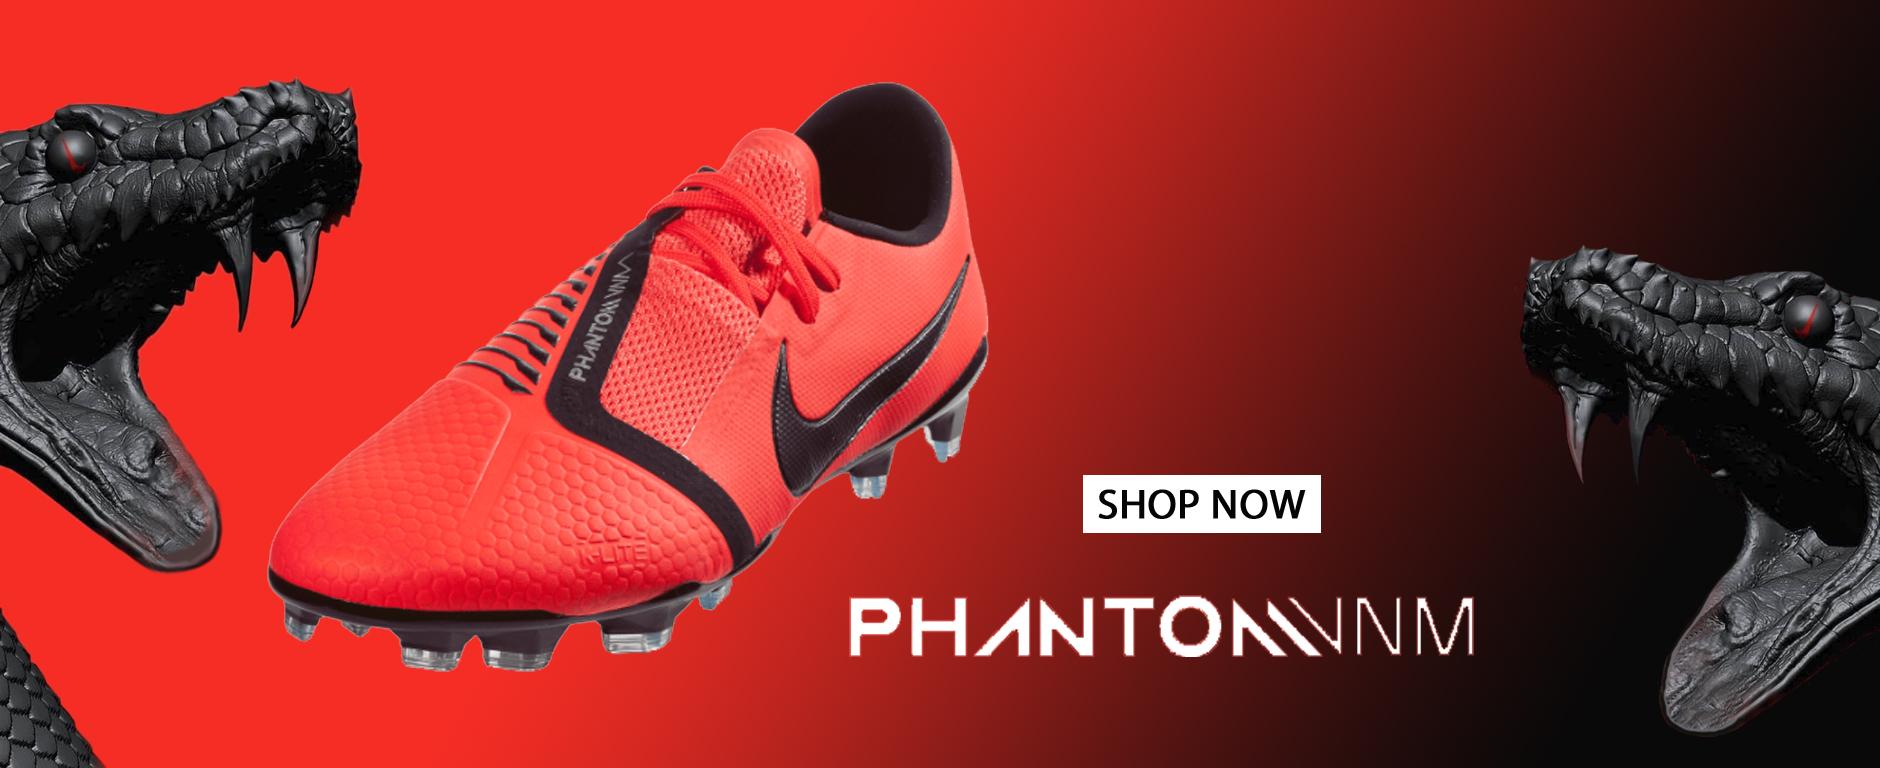 Best Soccer Store in California | OHP Soccer | 100 Percent